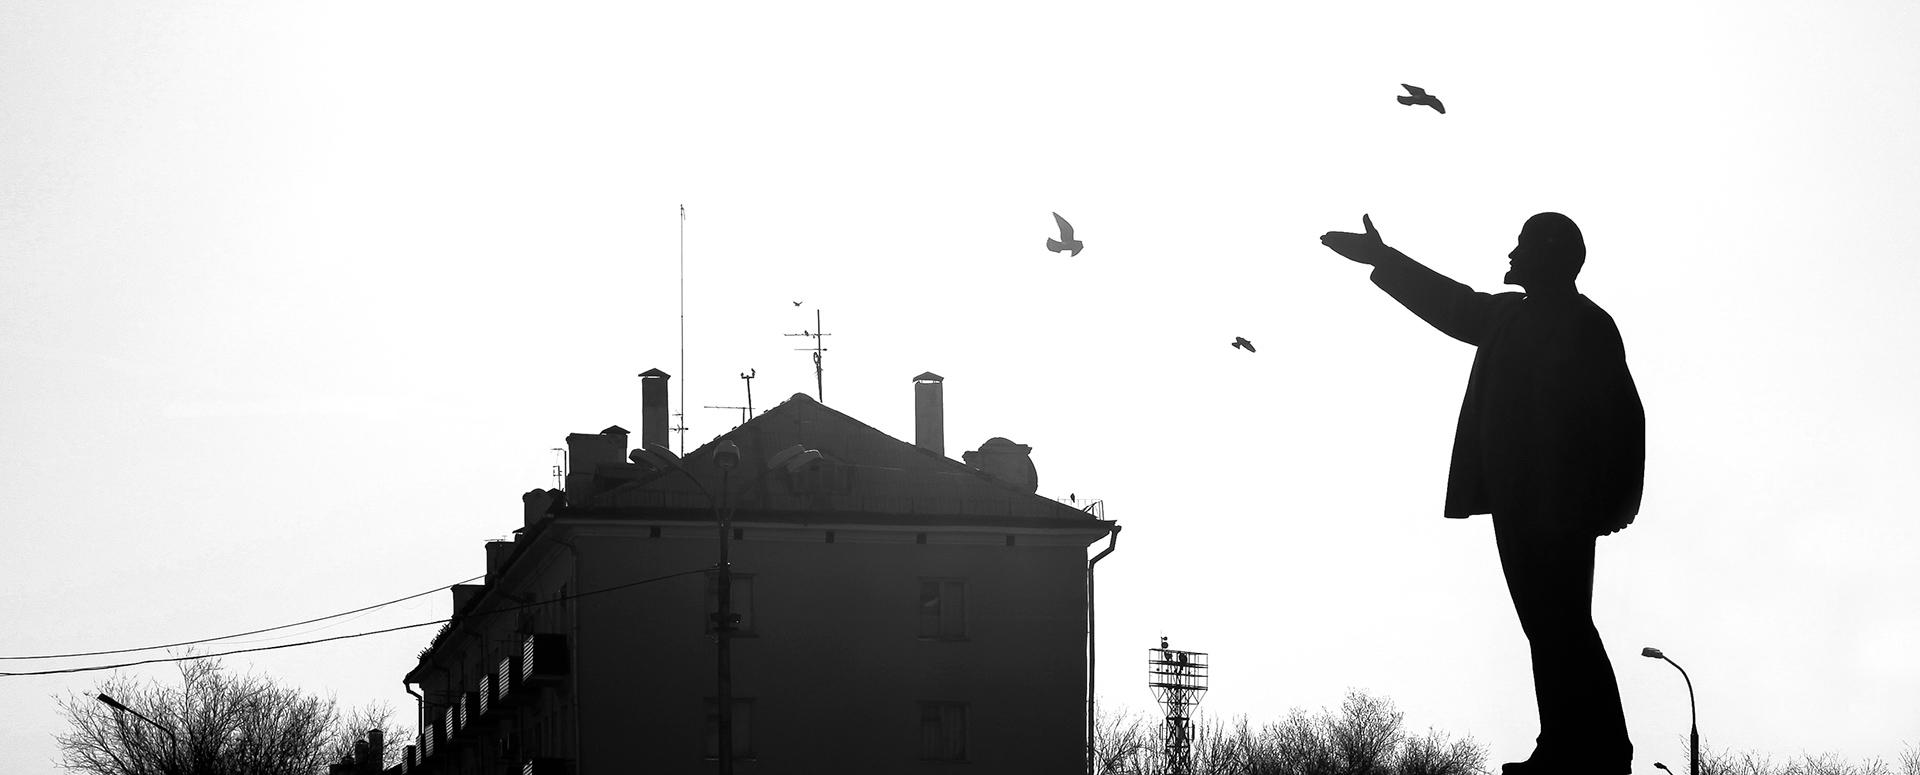 Central square, Baikonur, Lenin, Birds, USSR, Soviet Union